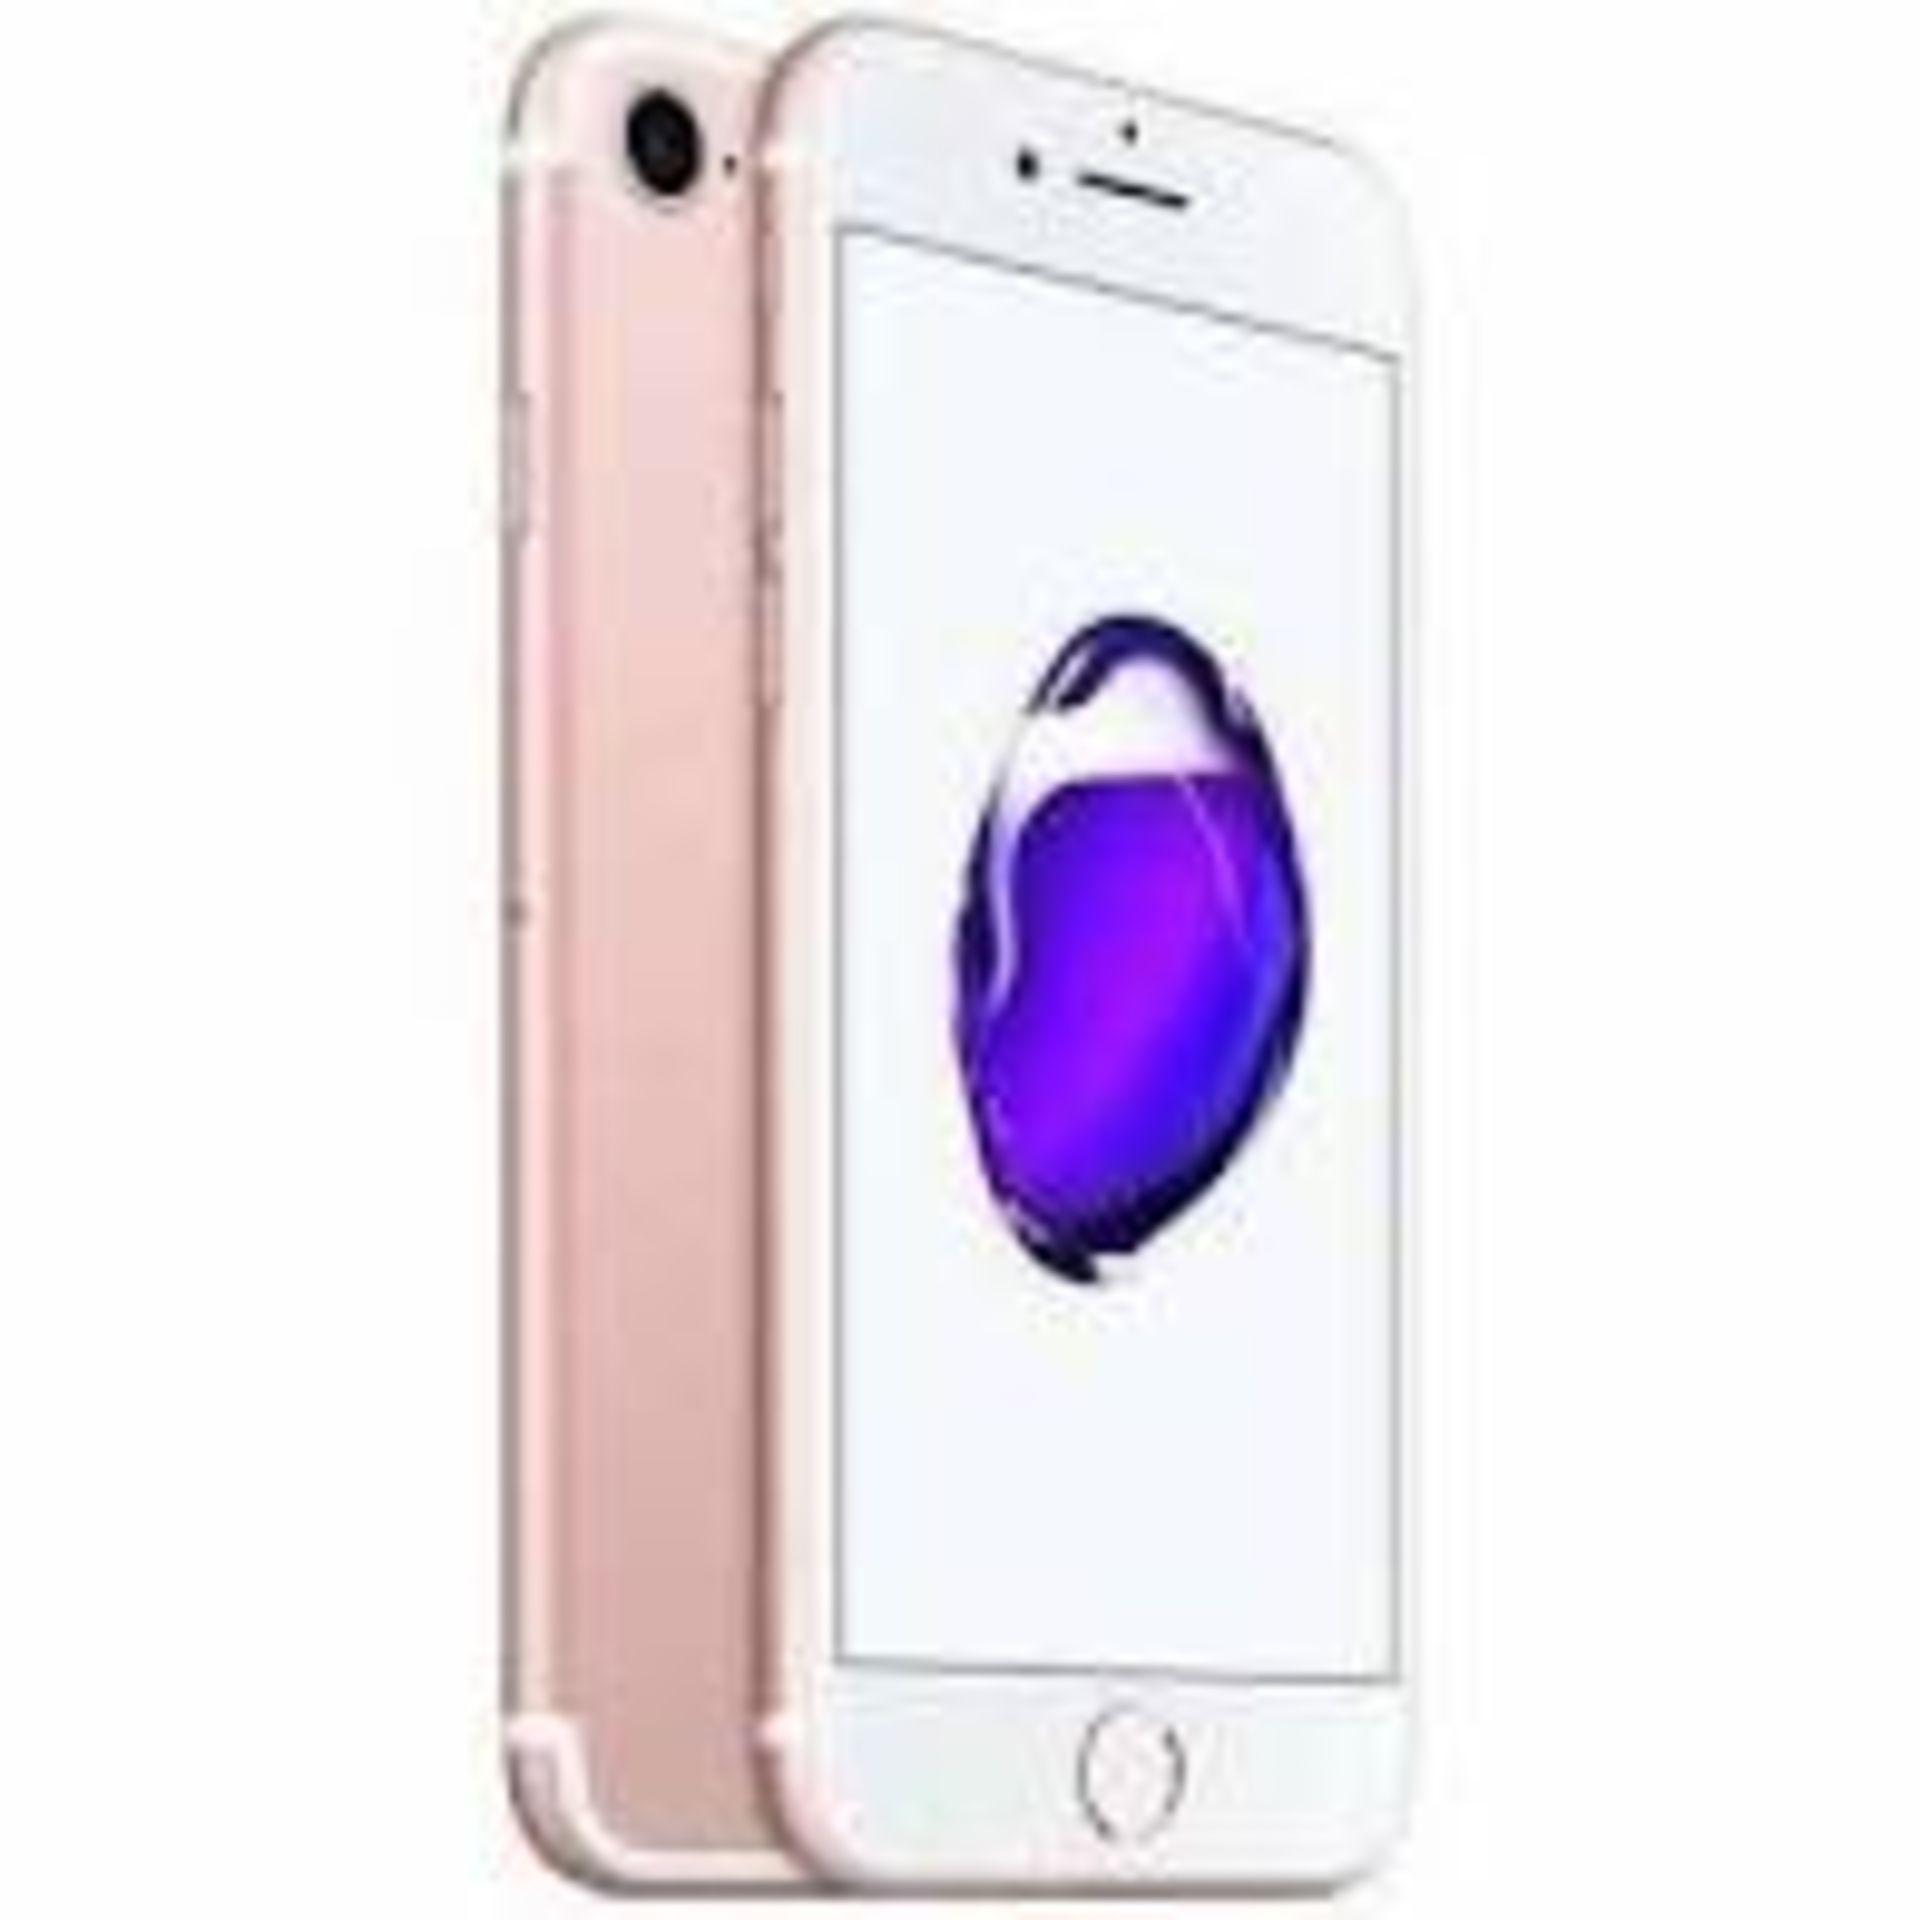 RRP £320 Apple iPhone 7 128GB Rose Gold